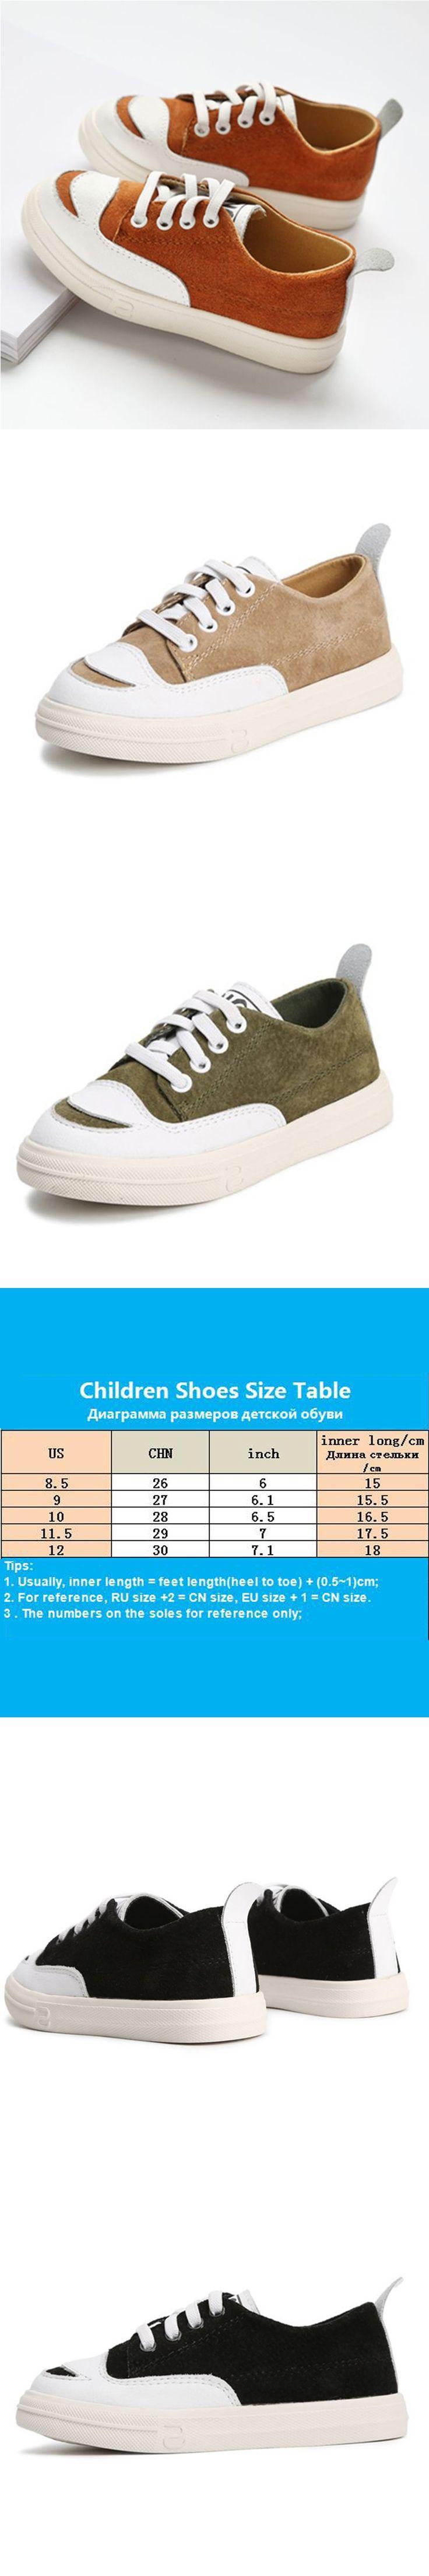 41 best Children s Shoes images on Pinterest